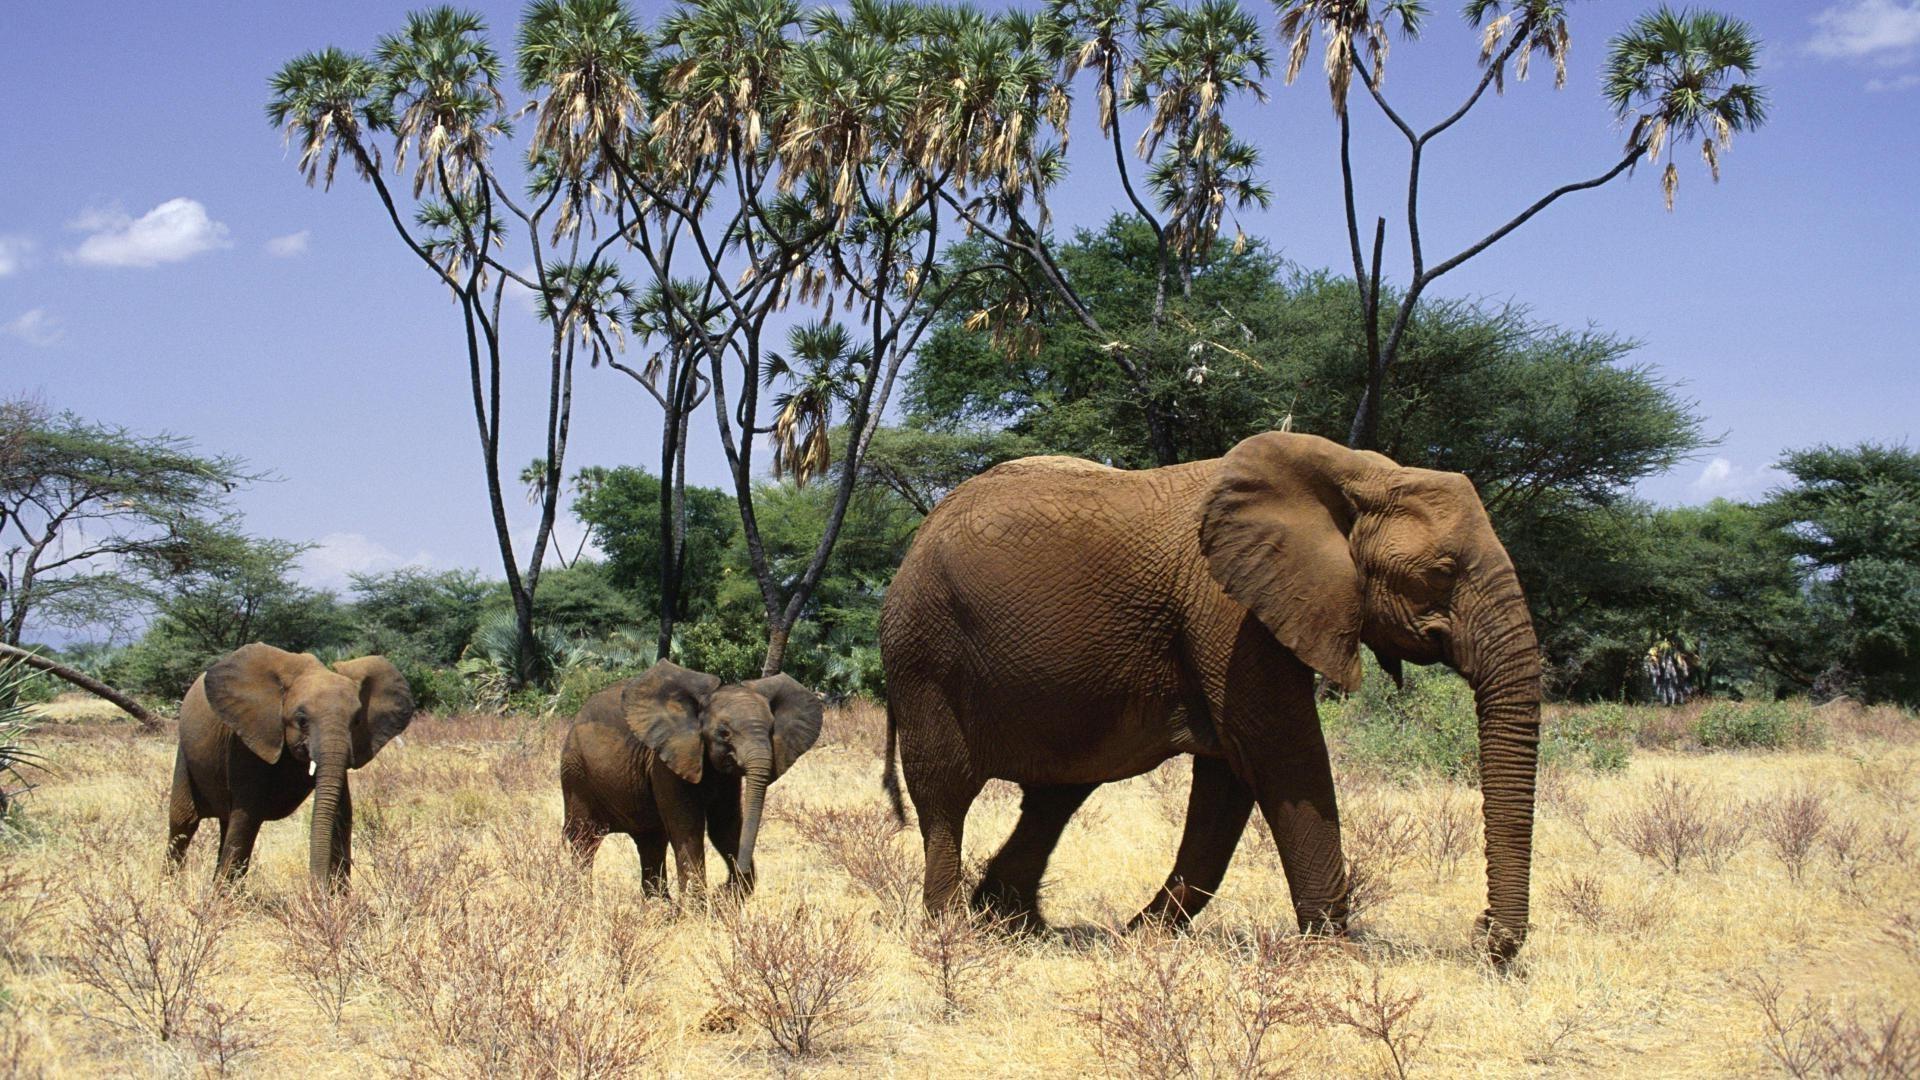 Most Inspiring Wallpaper Home Screen Elephant - 11831175604404508523  Pictures_739266.jpg